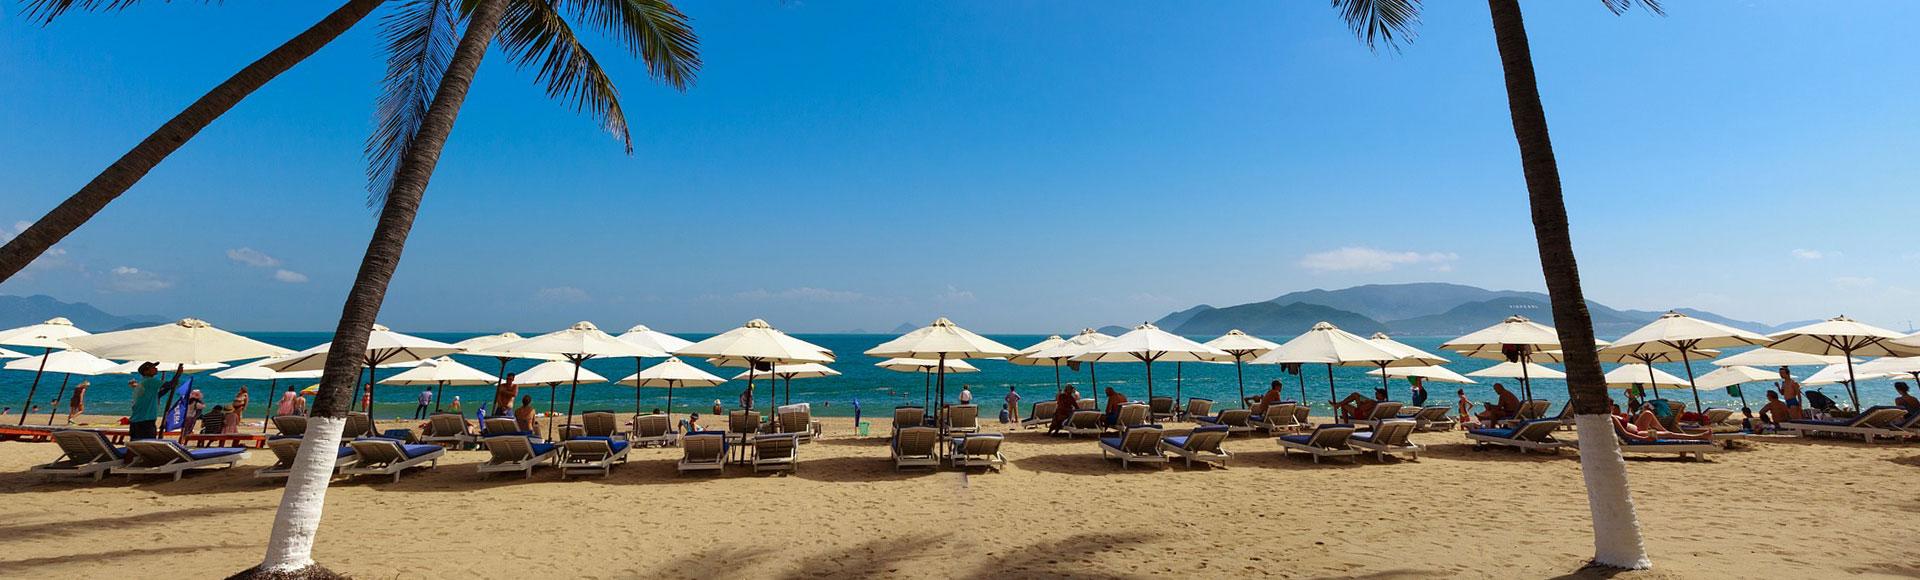 Nha Trang Travel Guide